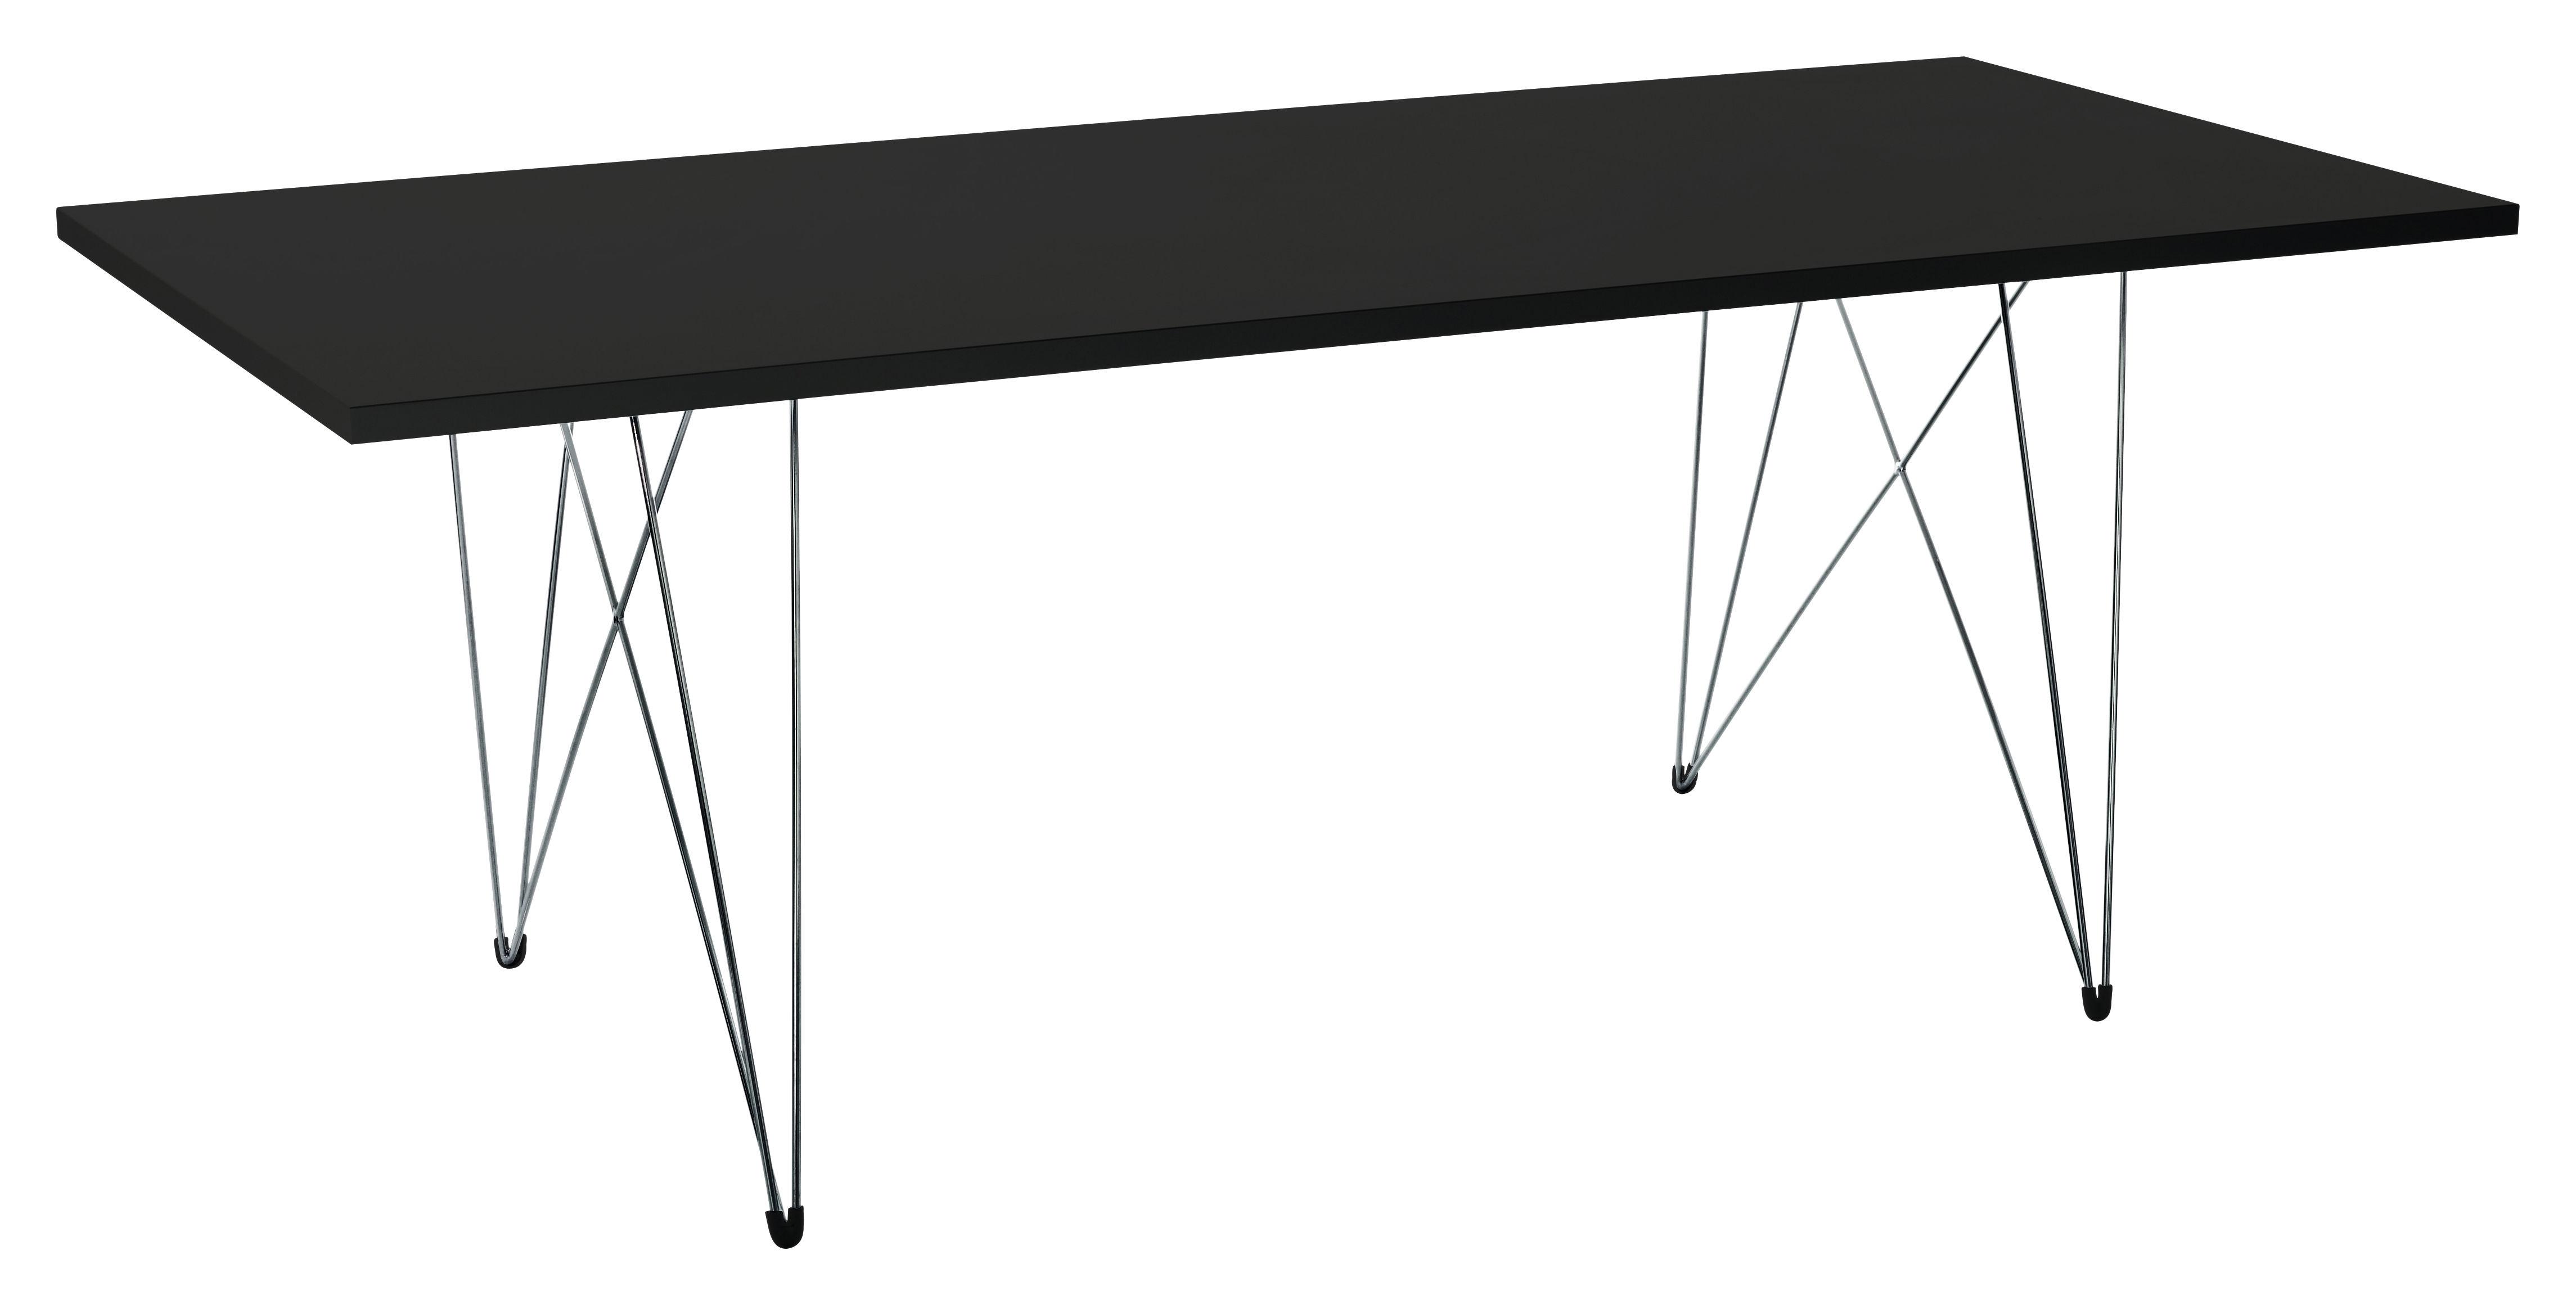 Table xz3 200 x 90 cm noir pied noir magis for Table 6a of gstr 1